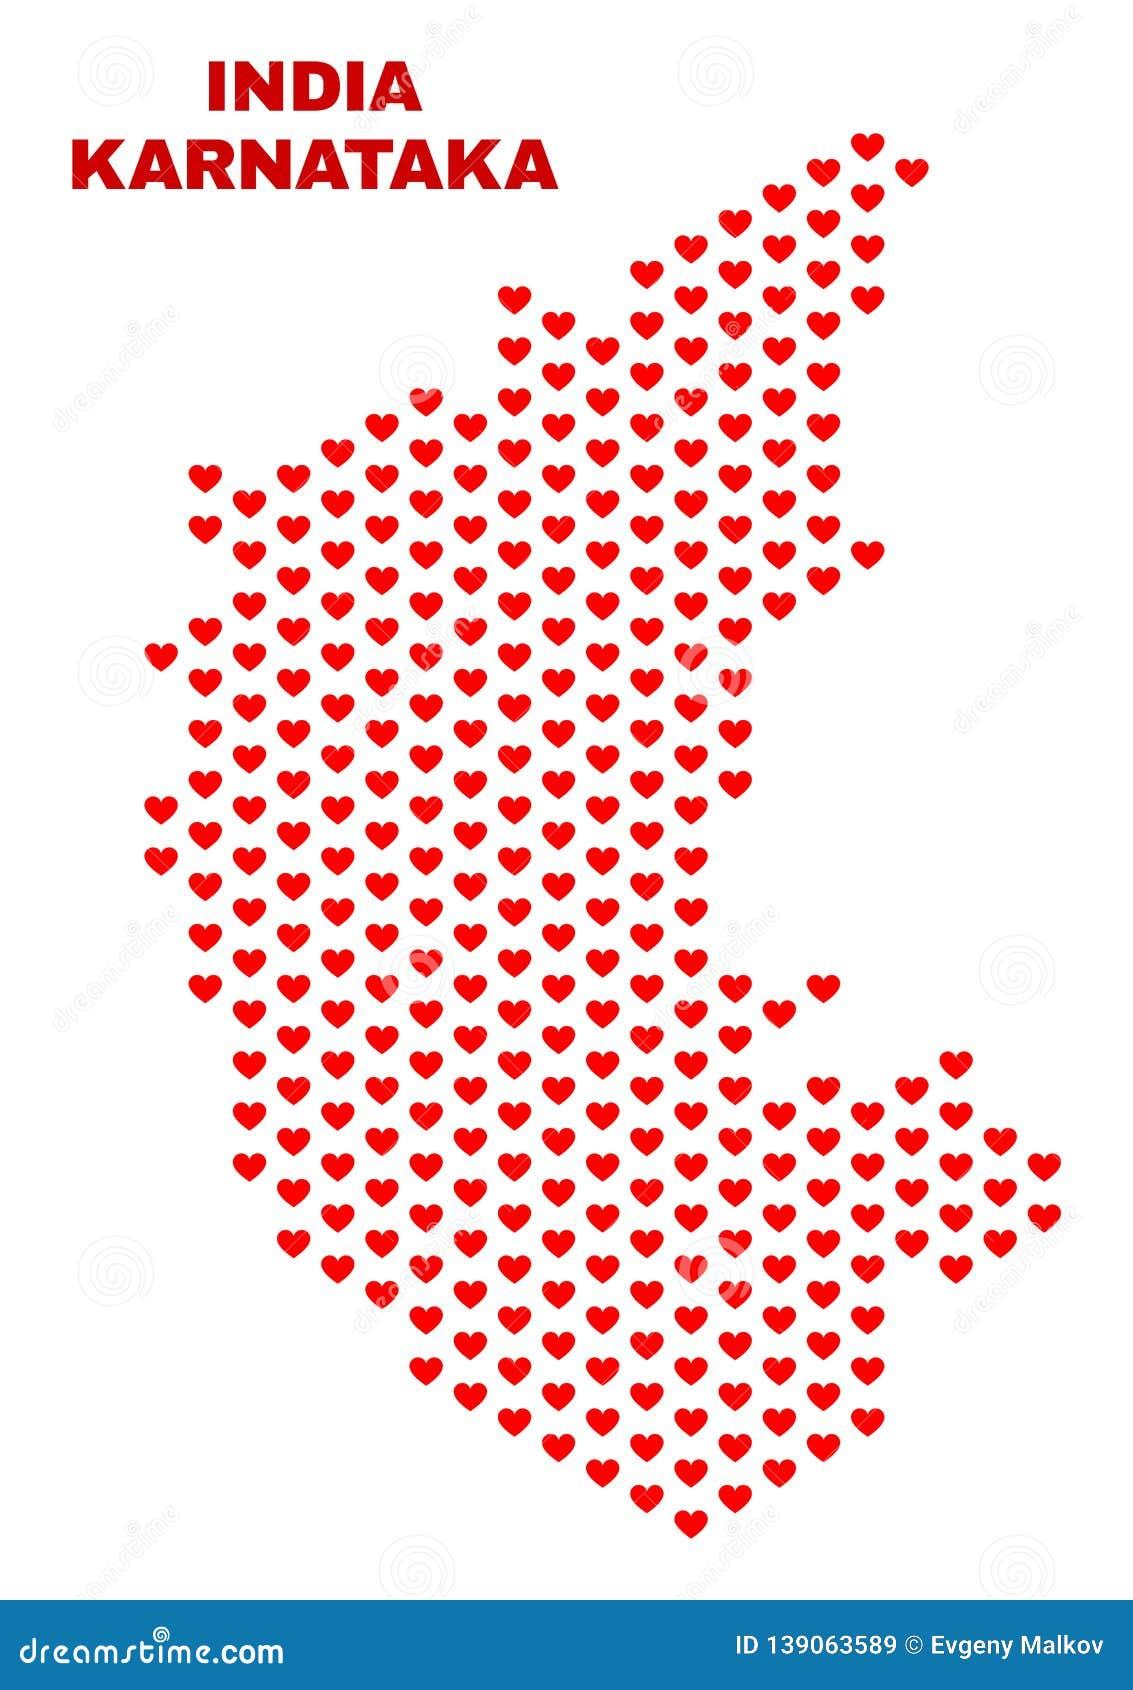 Karnataka State Map - Mosaic Of Valentine s Stock ... on gujarat state india map, bellary karnataka india map, bihar state india map,